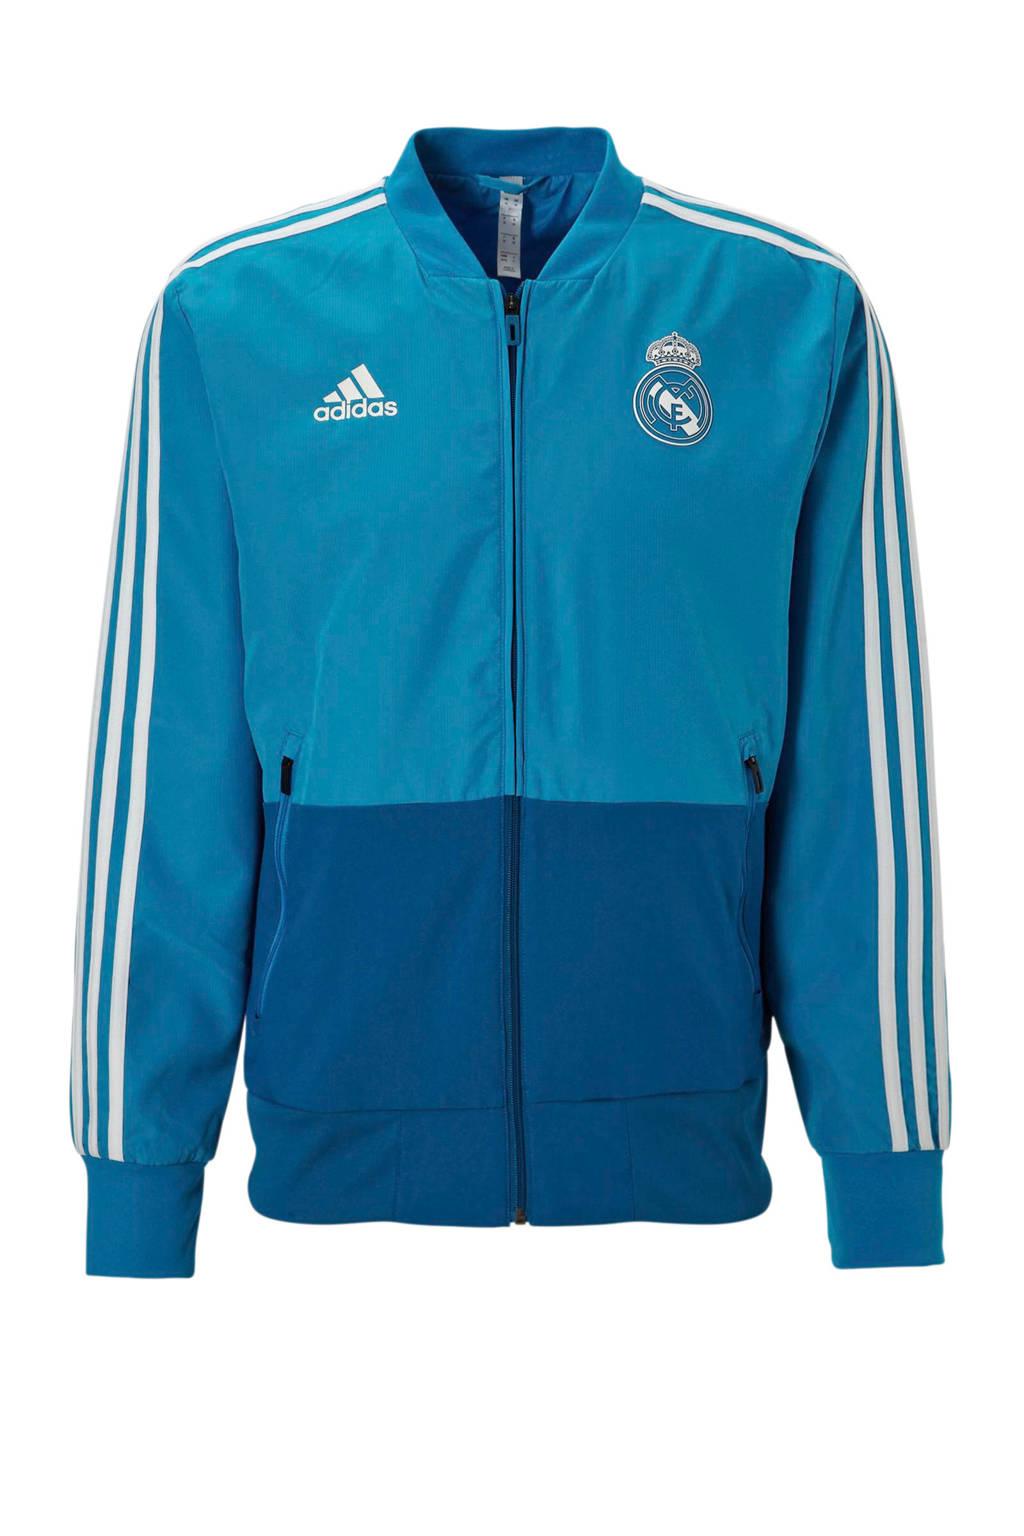 adidas performance  Real Madrid sportvest, Blauw/wit